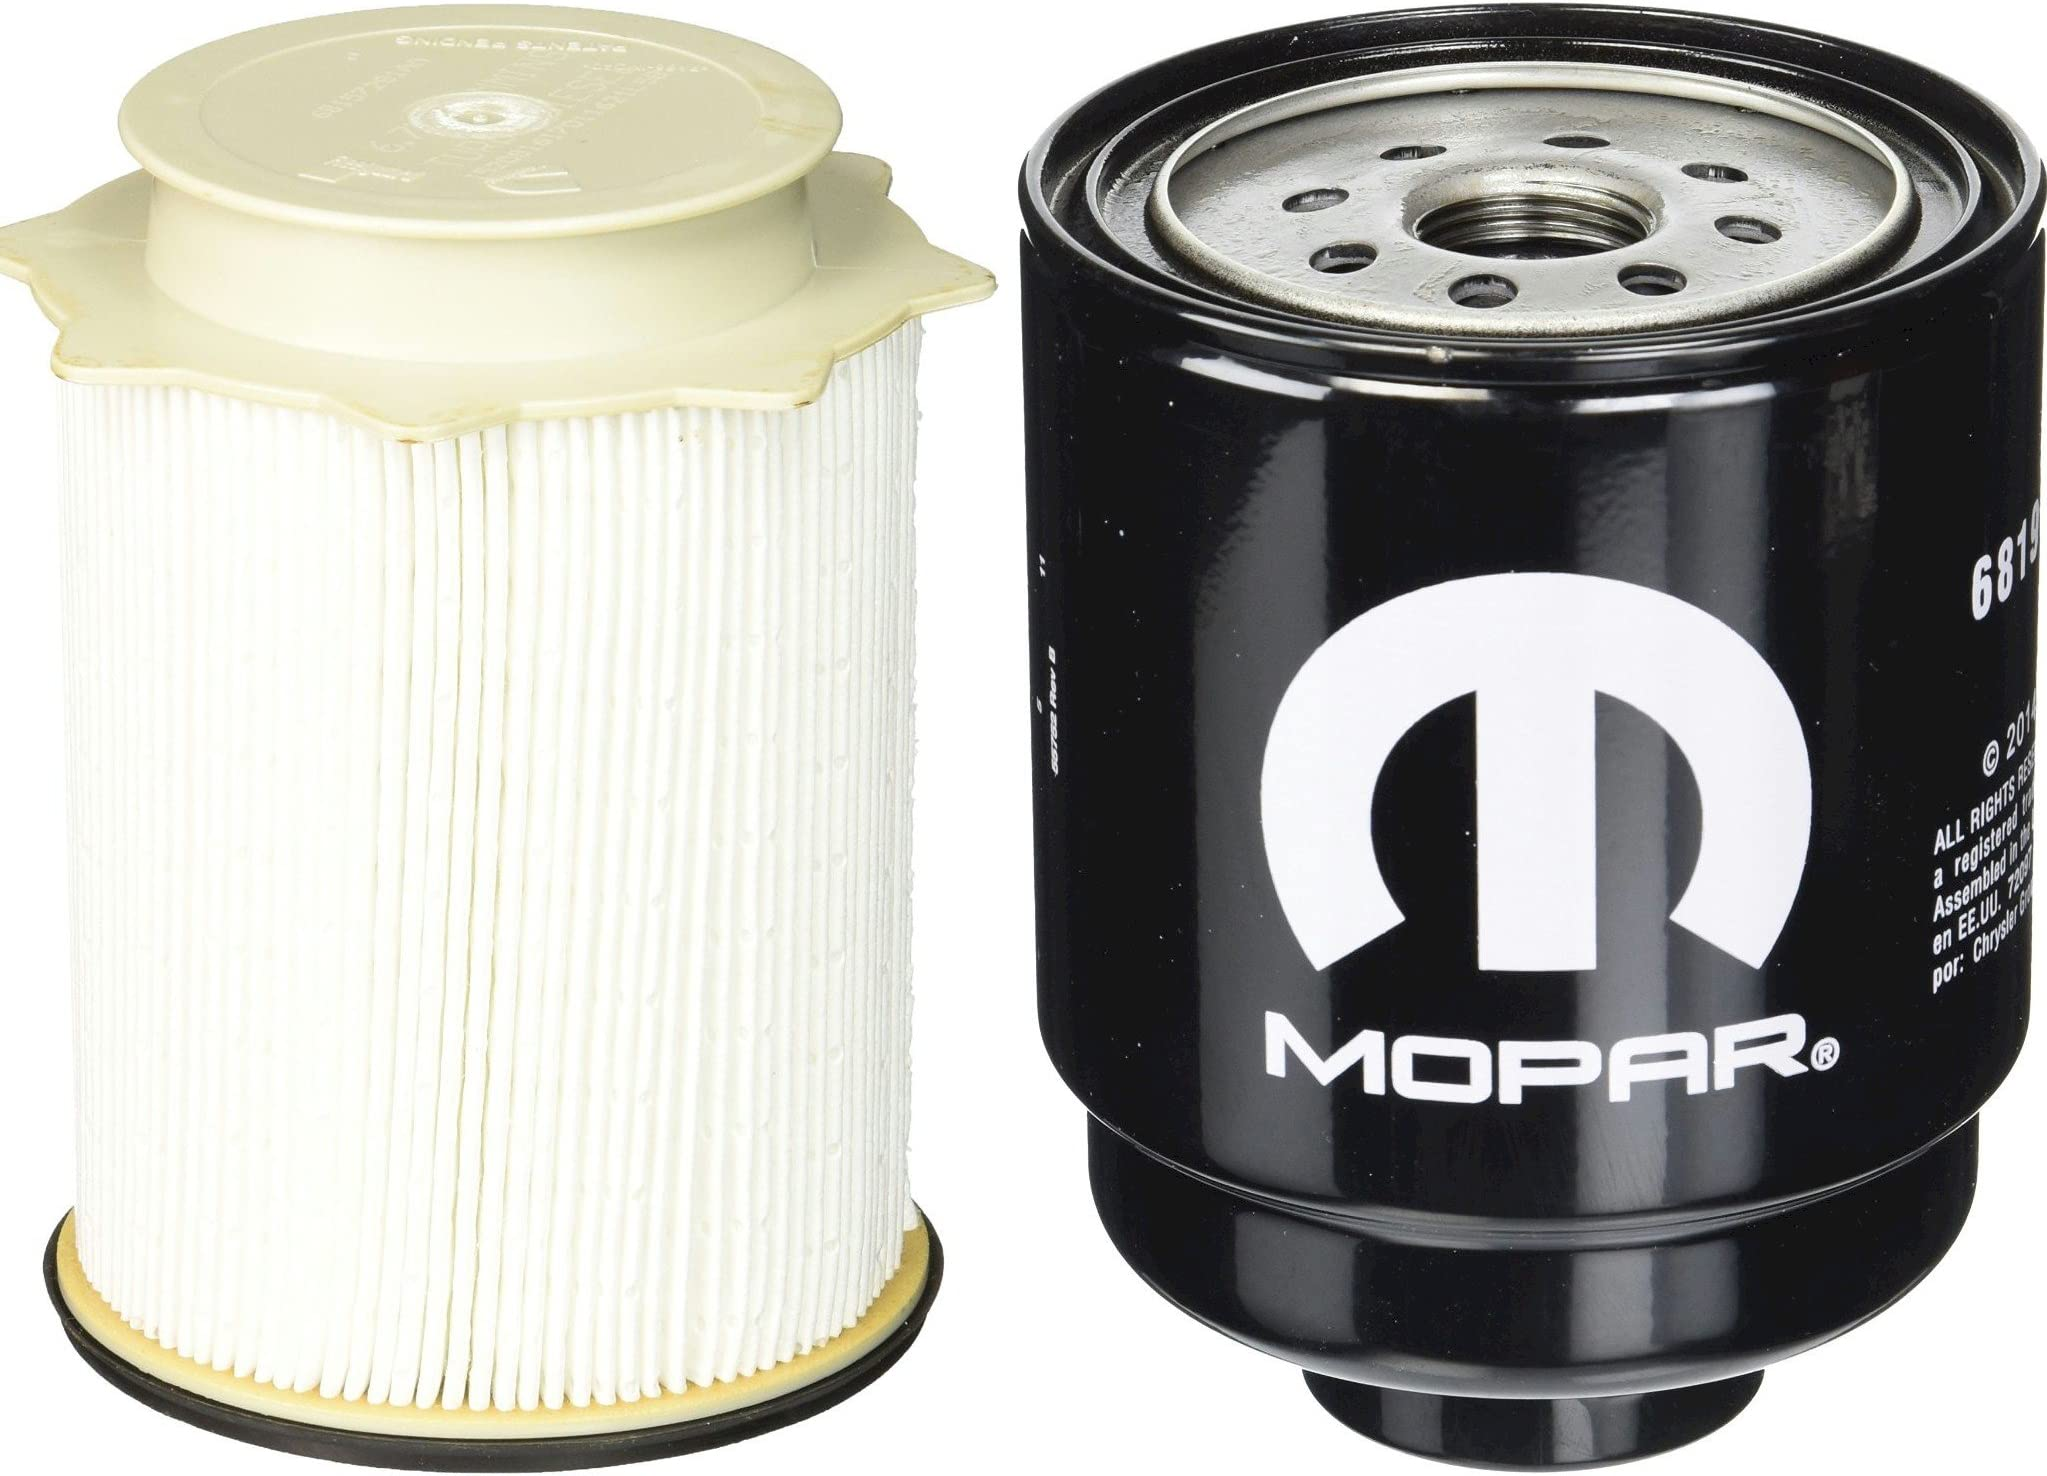 amazon com fuel filters replacement parts automotivedodge ram 6 7 liter diesel fuel filter water separator set mopar oem